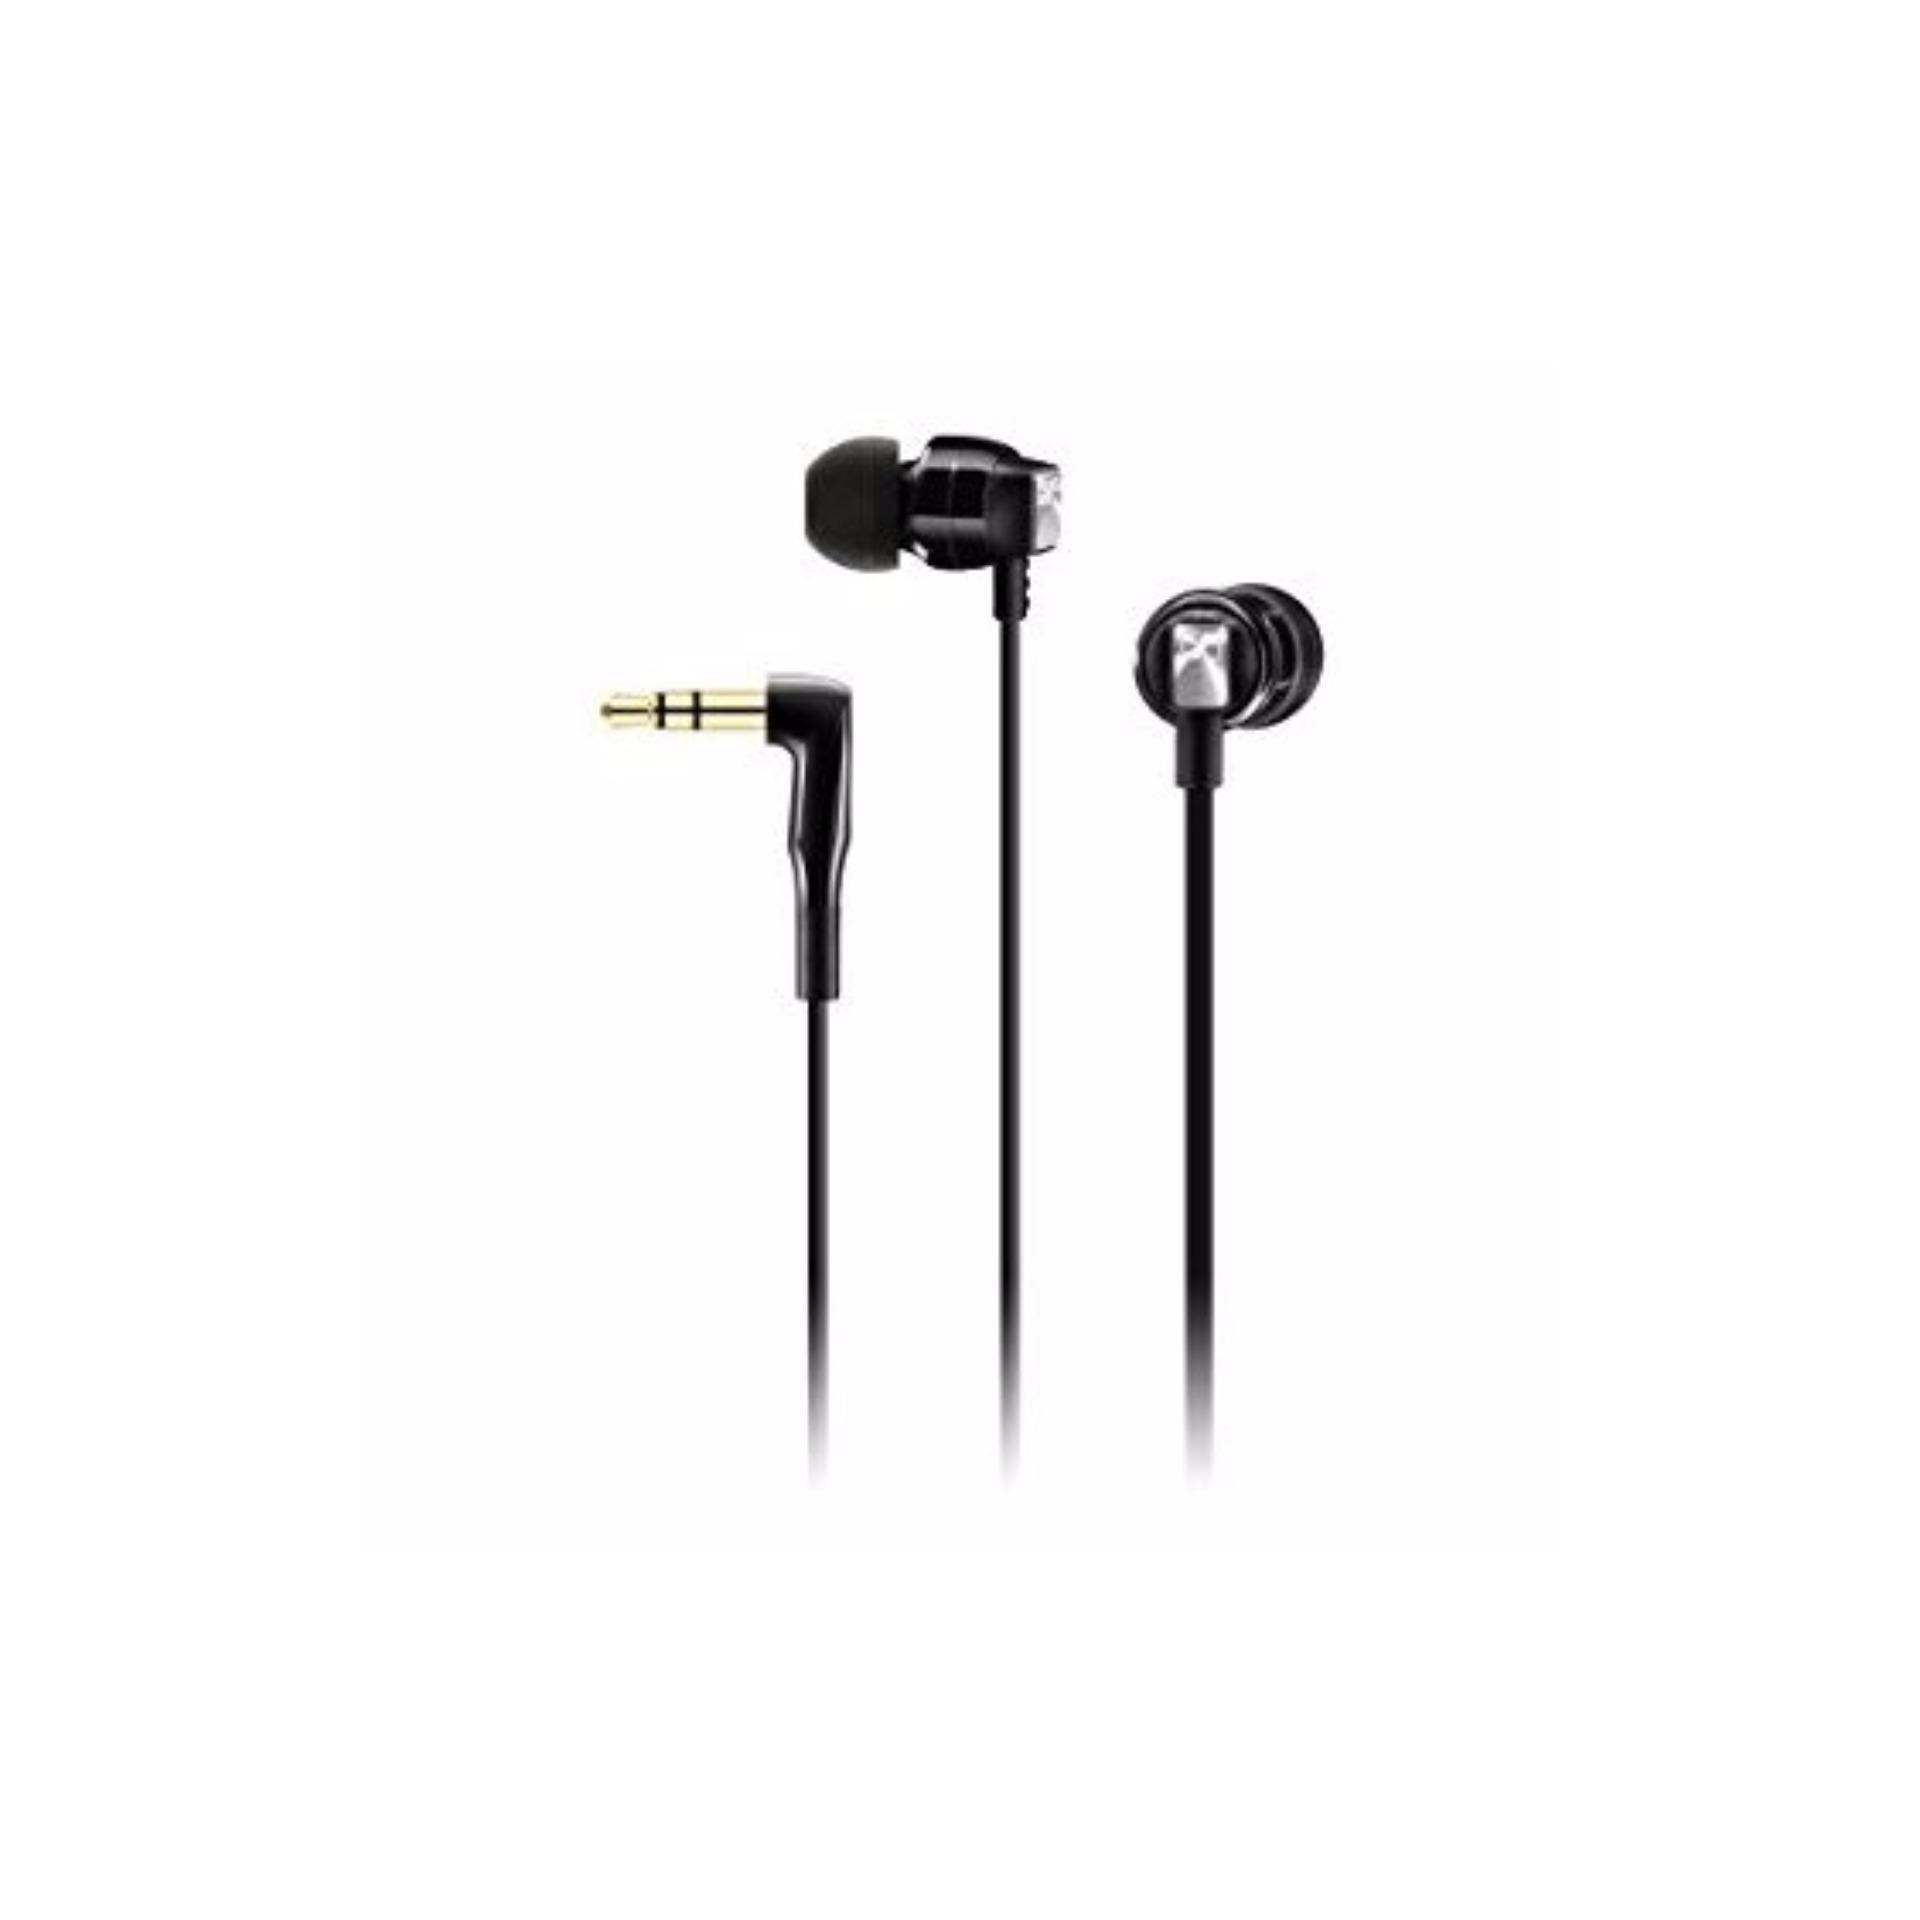 Promo Harga Sennheiser Headphone Hd 430g White Terbaru 2018 7 Dj Headphones Hitam Hemat 420s Headset Earphone Senheiser Hd4 Cx 300 In Ear